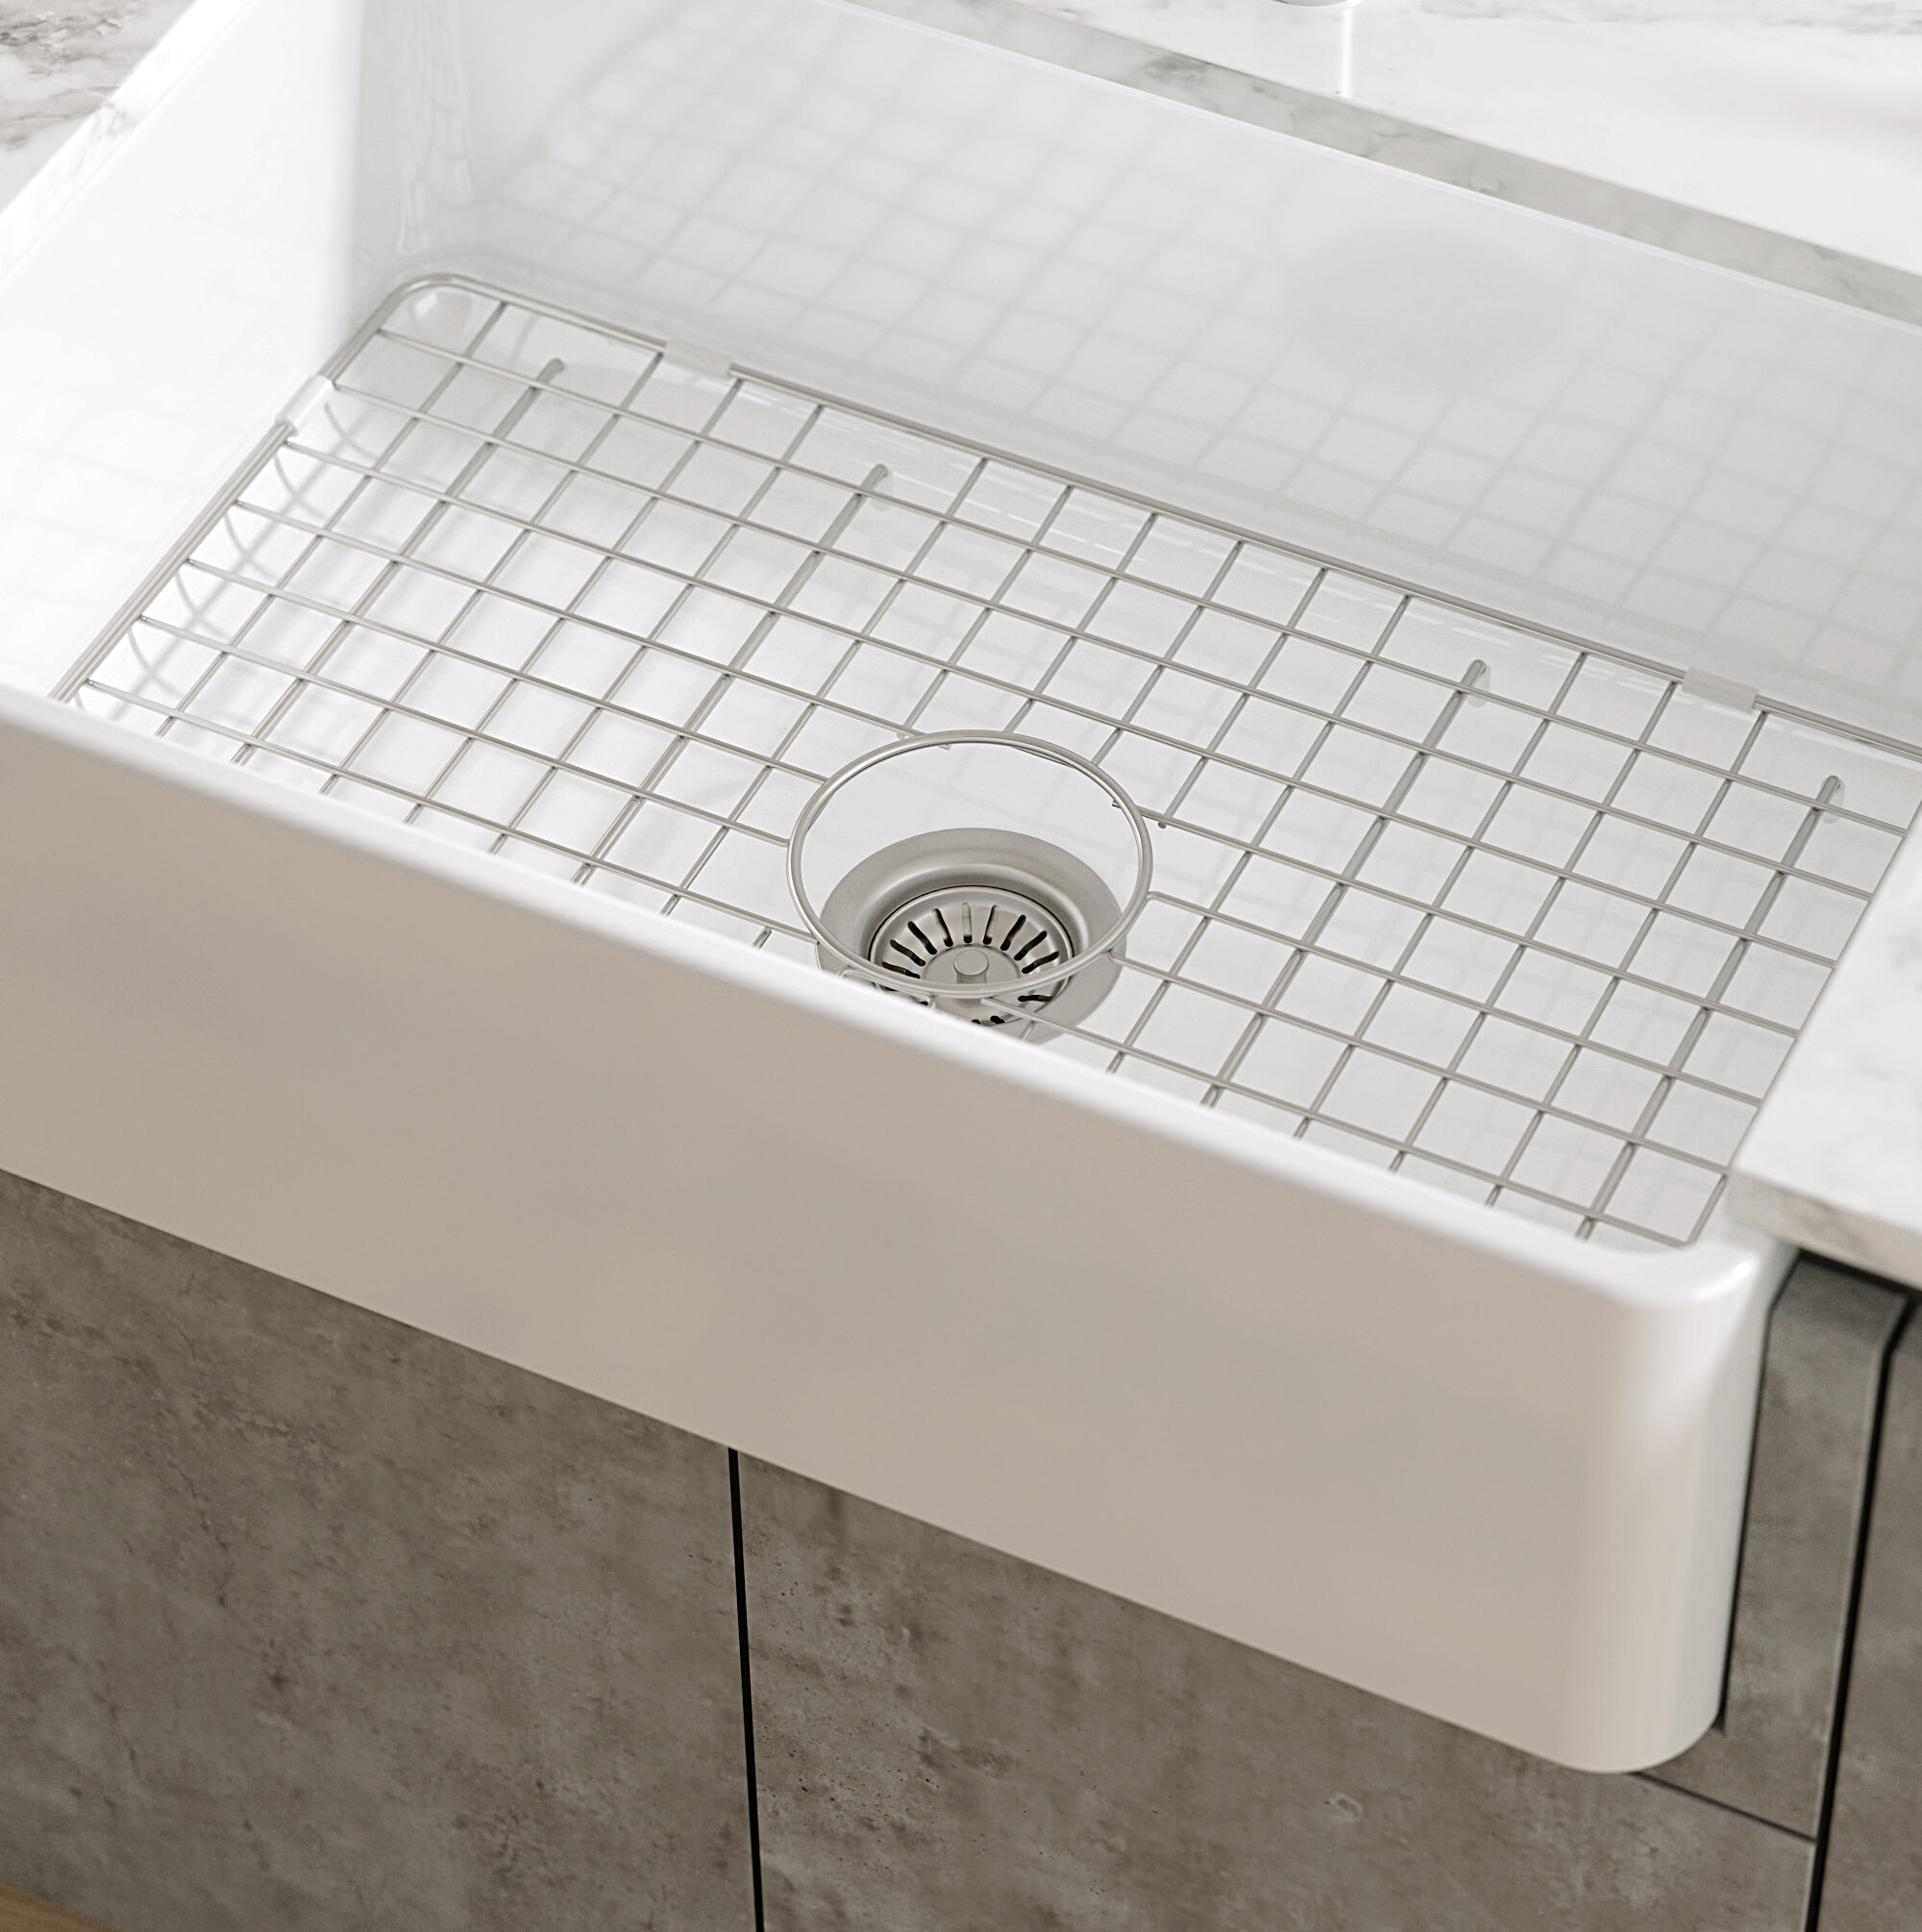 lavatory at single com faucetline enlarge lady control la image faucets buy toscana latoscana faucet